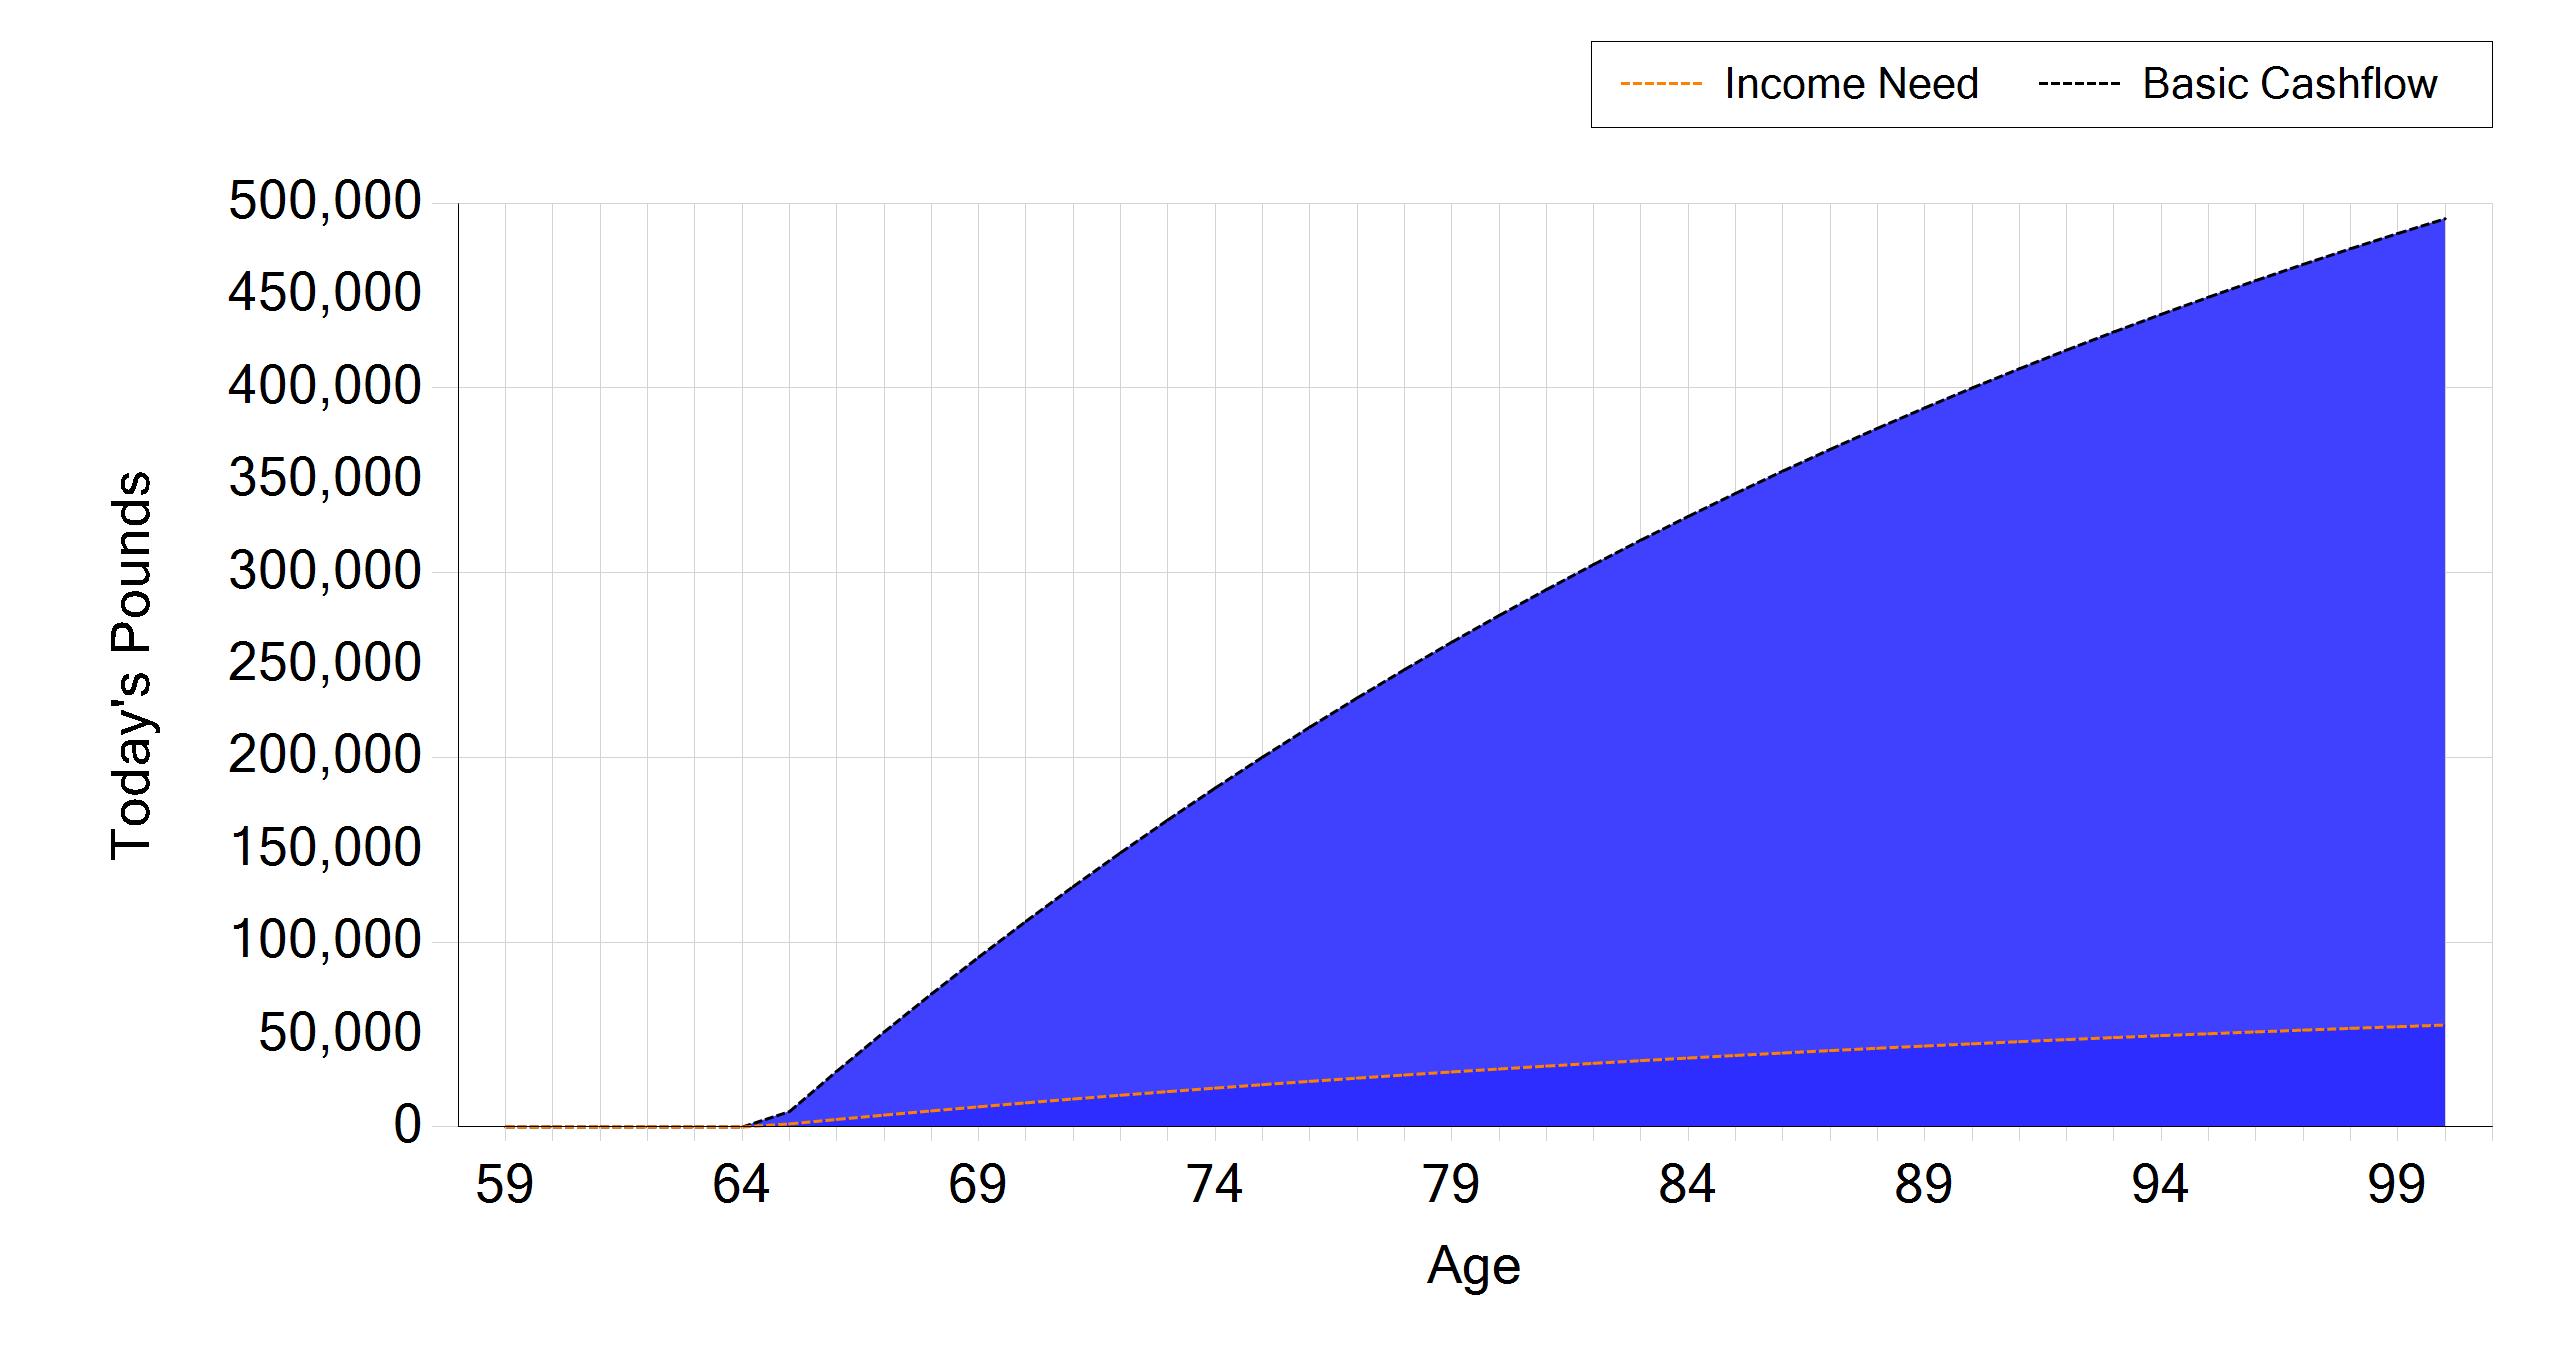 Bob Cashflow 2 income need retirement overlay